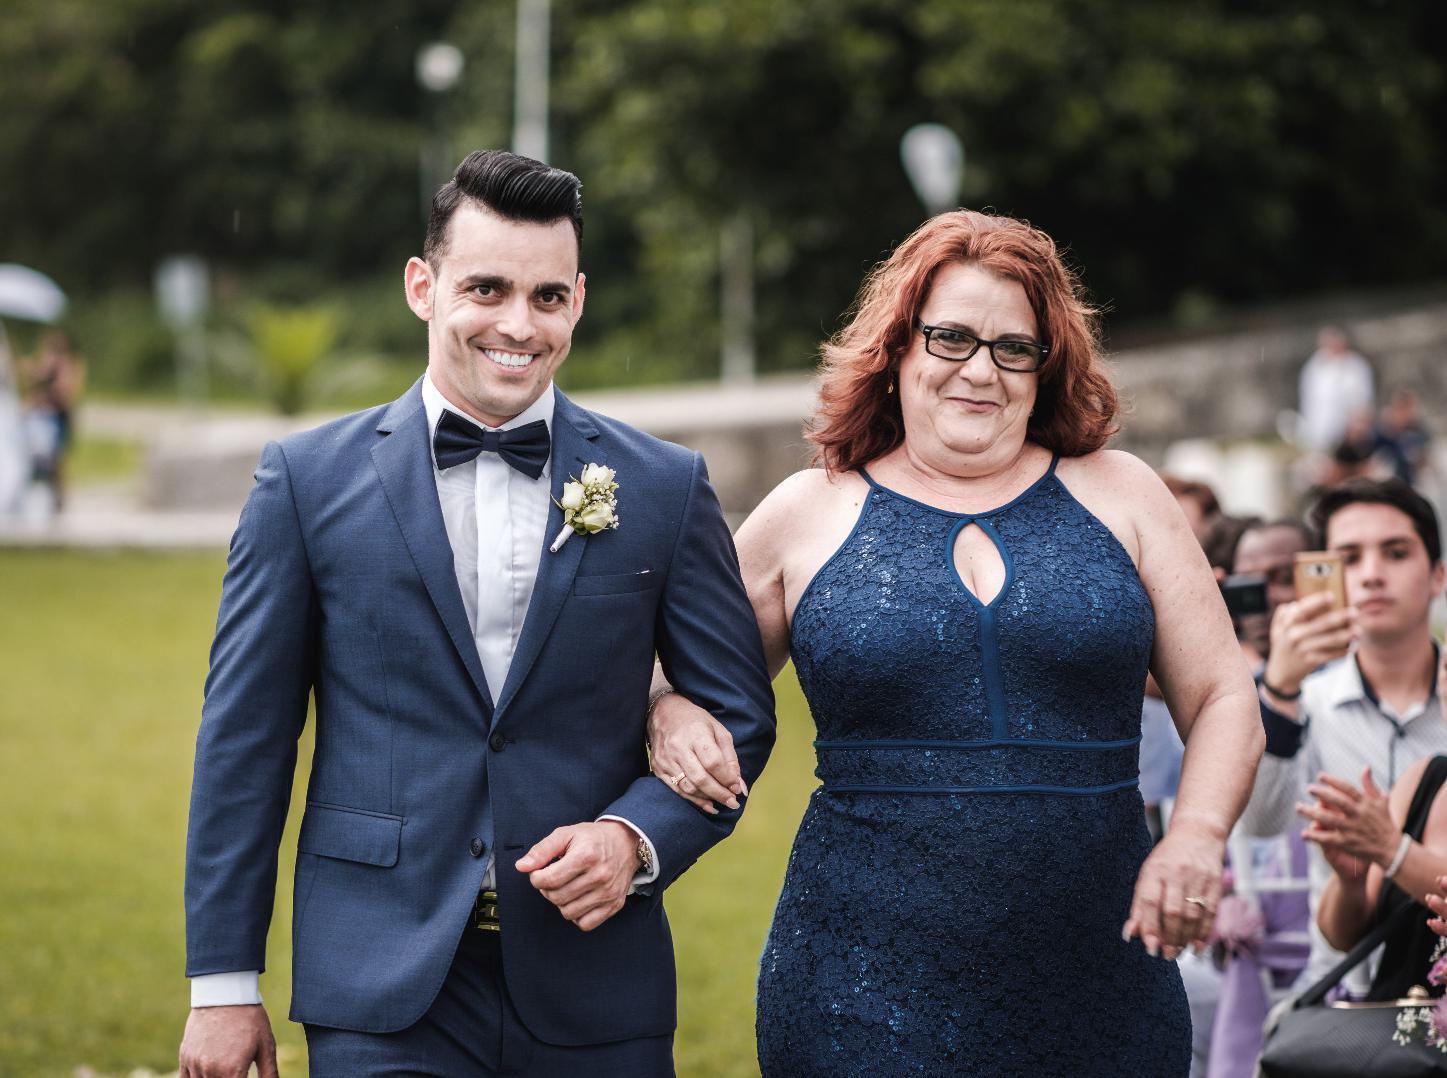 bodas-sin-clasificar-sin-tema-cuba-35541.jpg